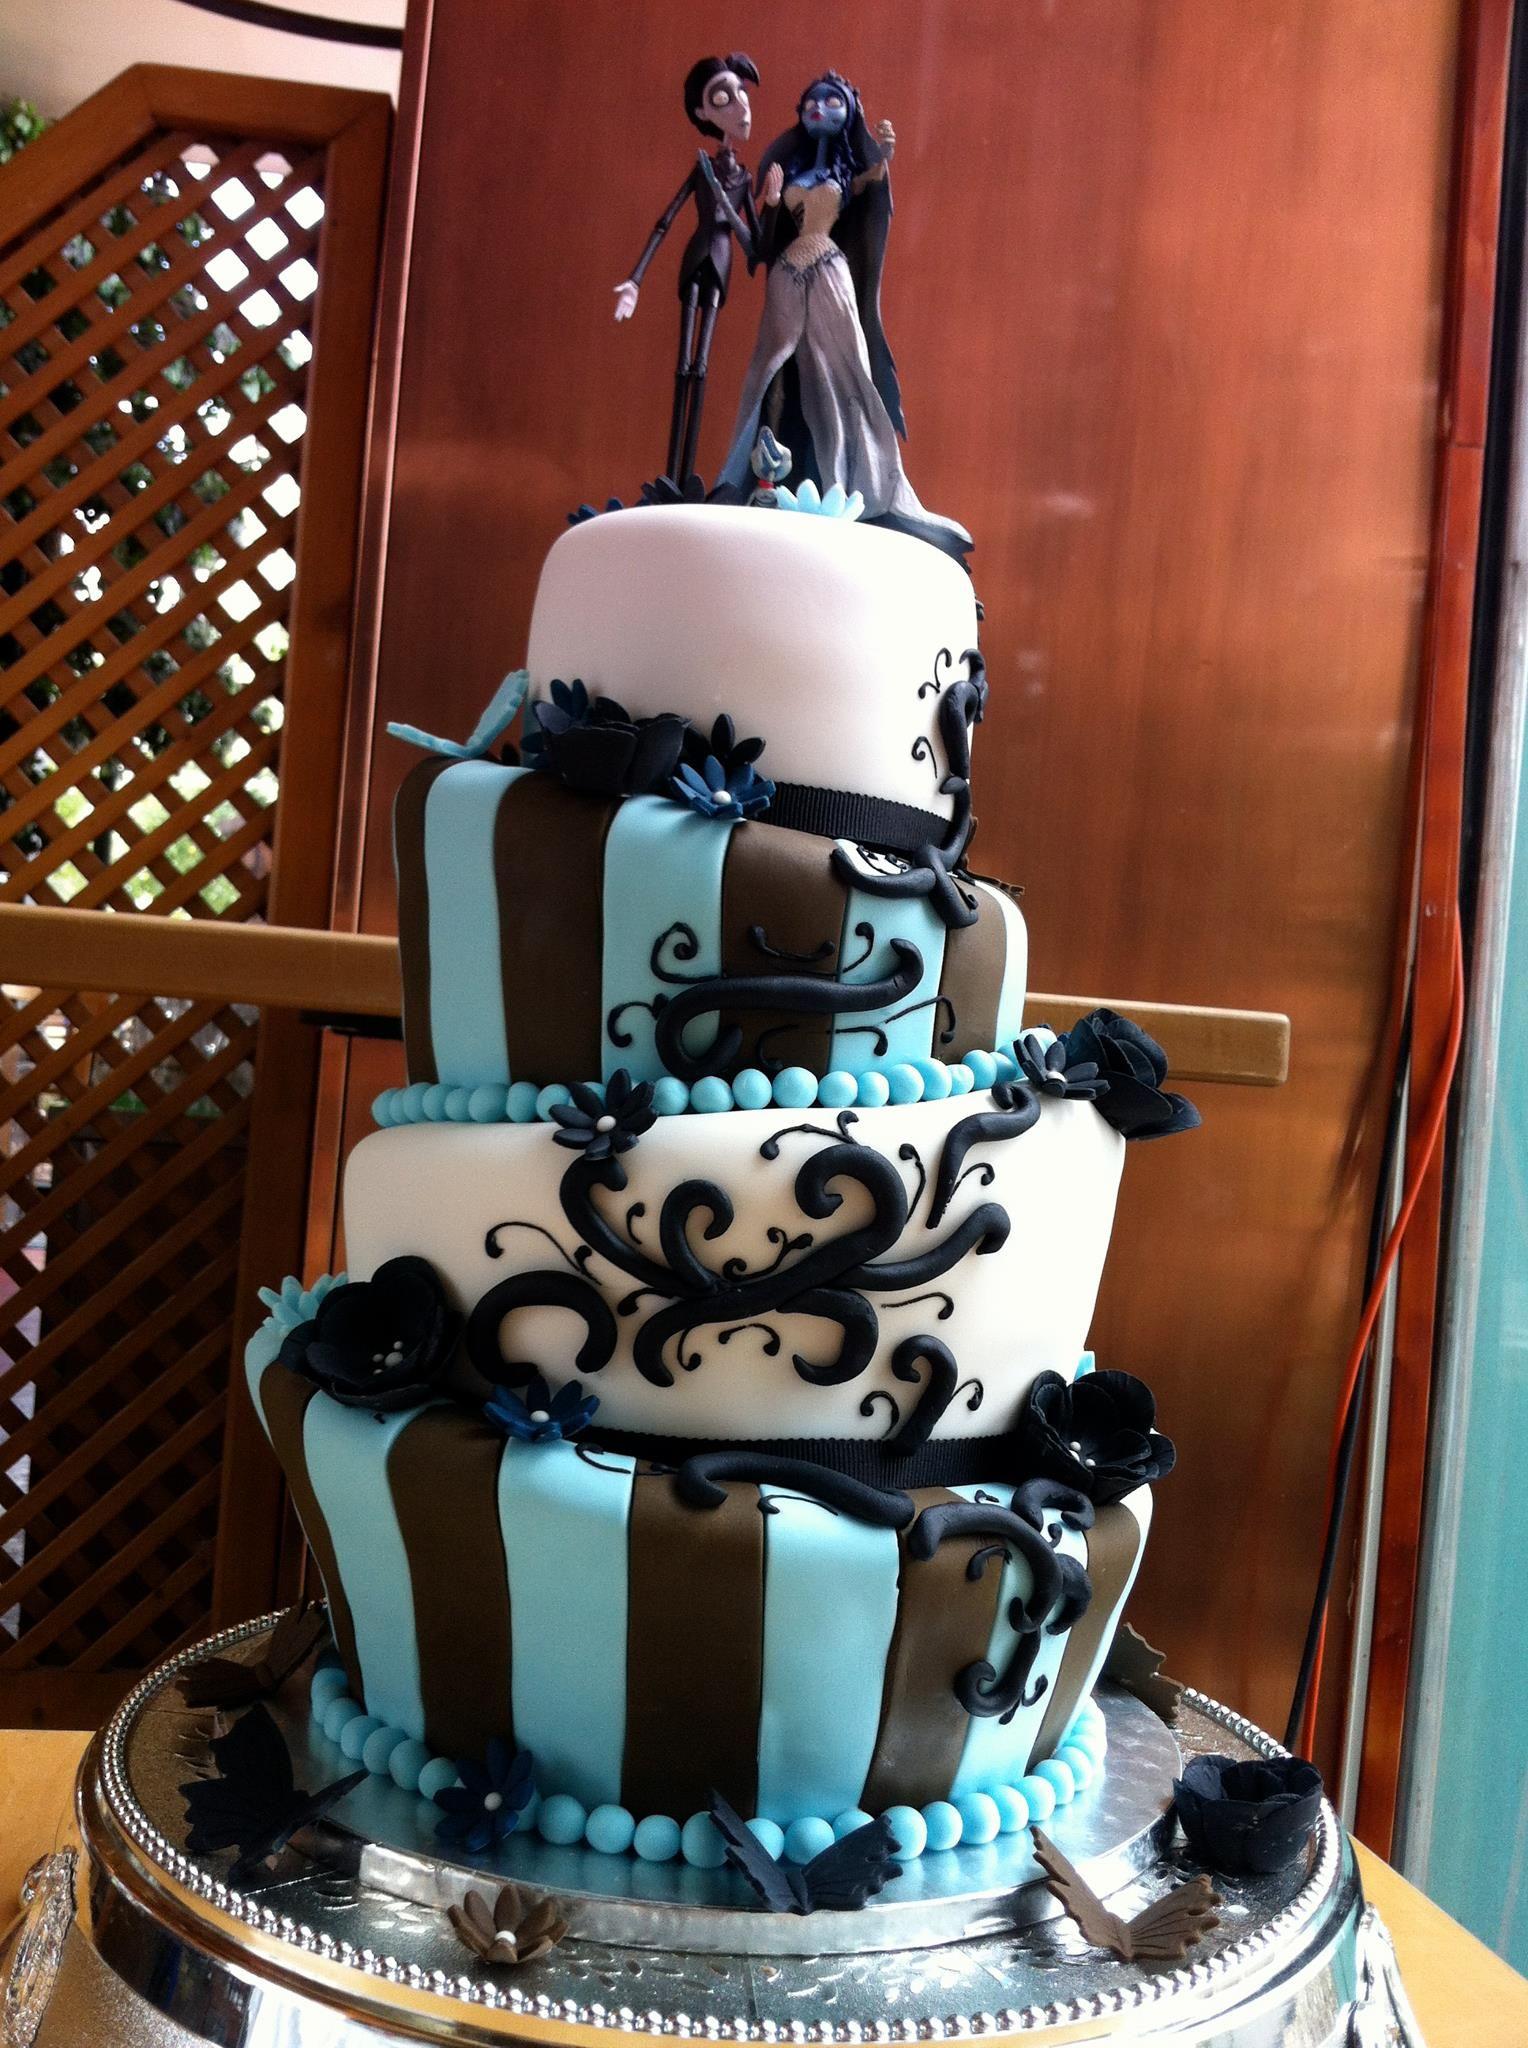 Pin by Elven Ebony on Wedding | Pinterest | Wedding